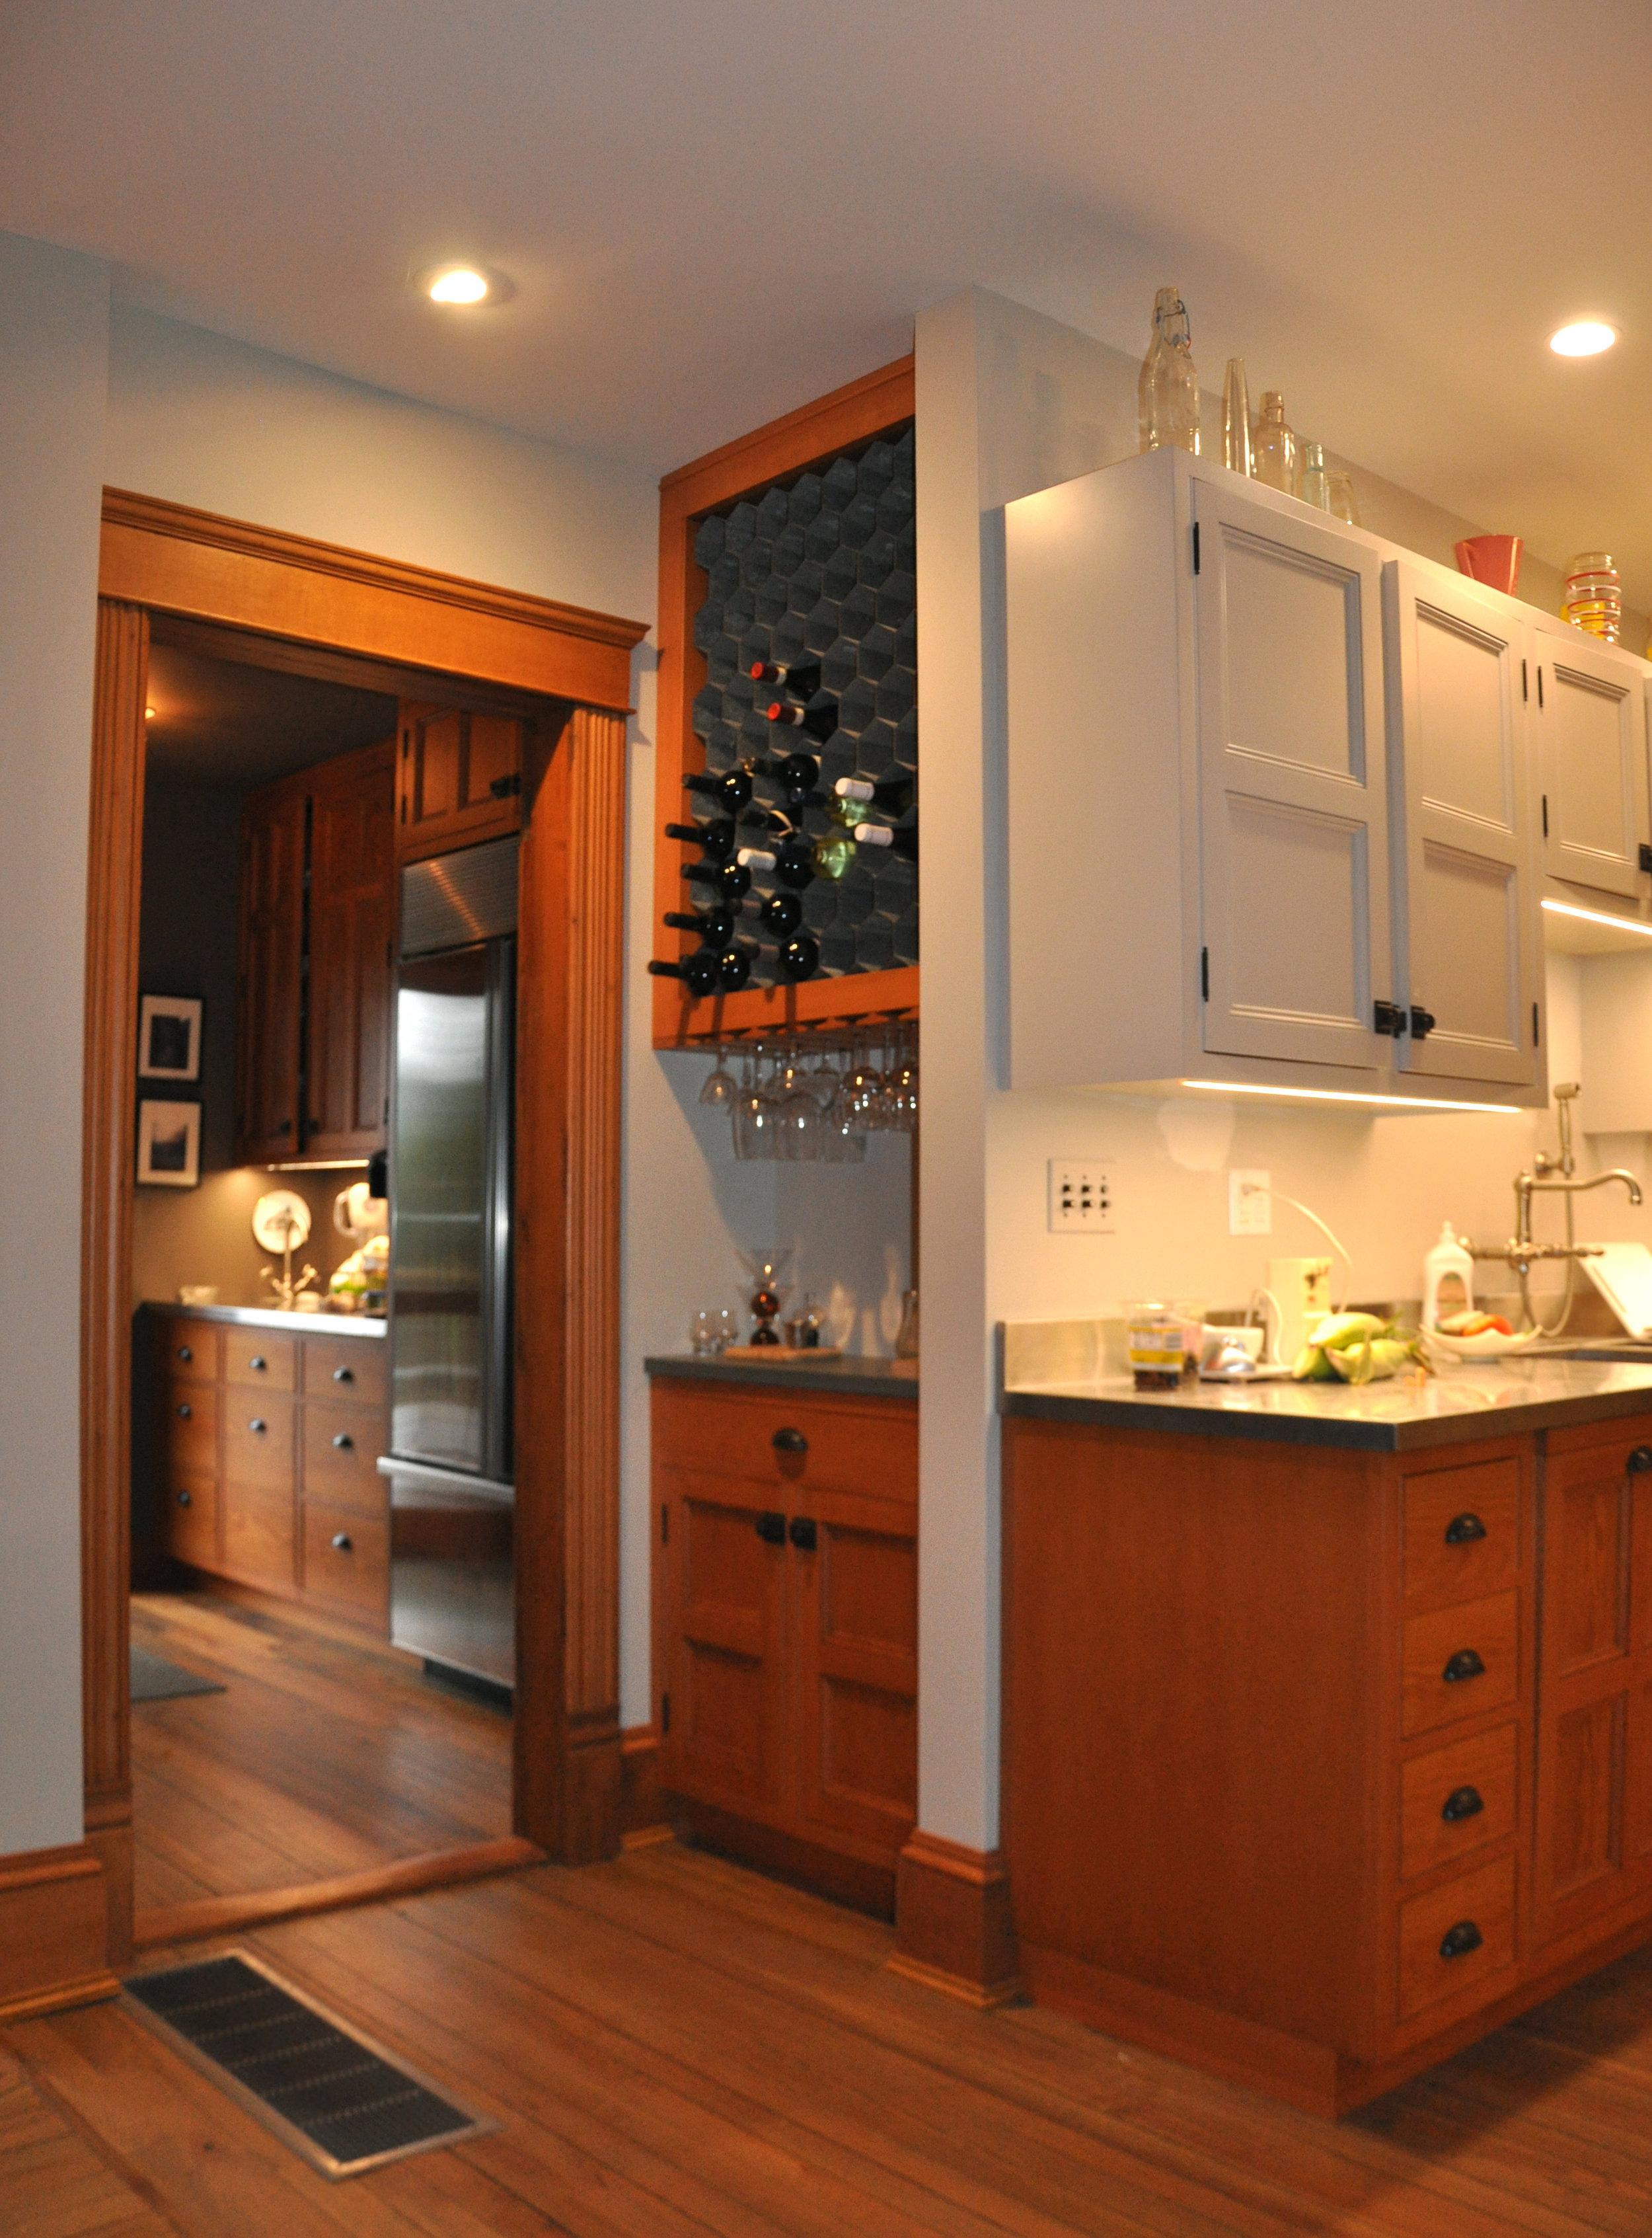 modernized rural farmhouse, residential renovation, open plan, new kitchen, new interior finishes, bar, wine storage, pantry